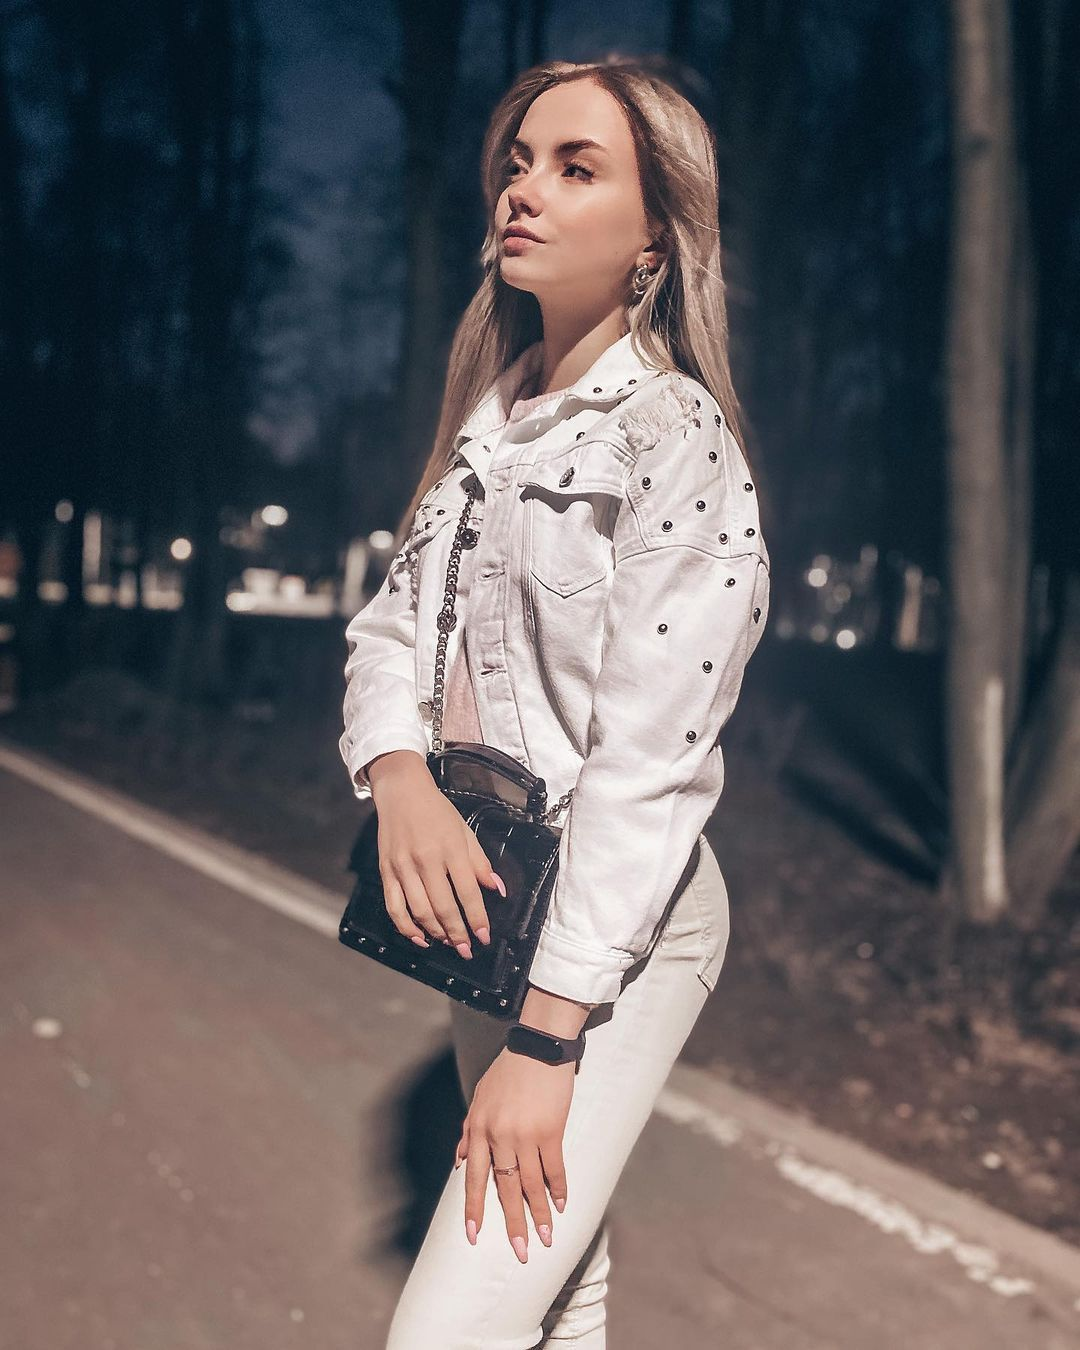 Anastasia-Fefilova-Wallpapers-Insta-Fit-Bio-4